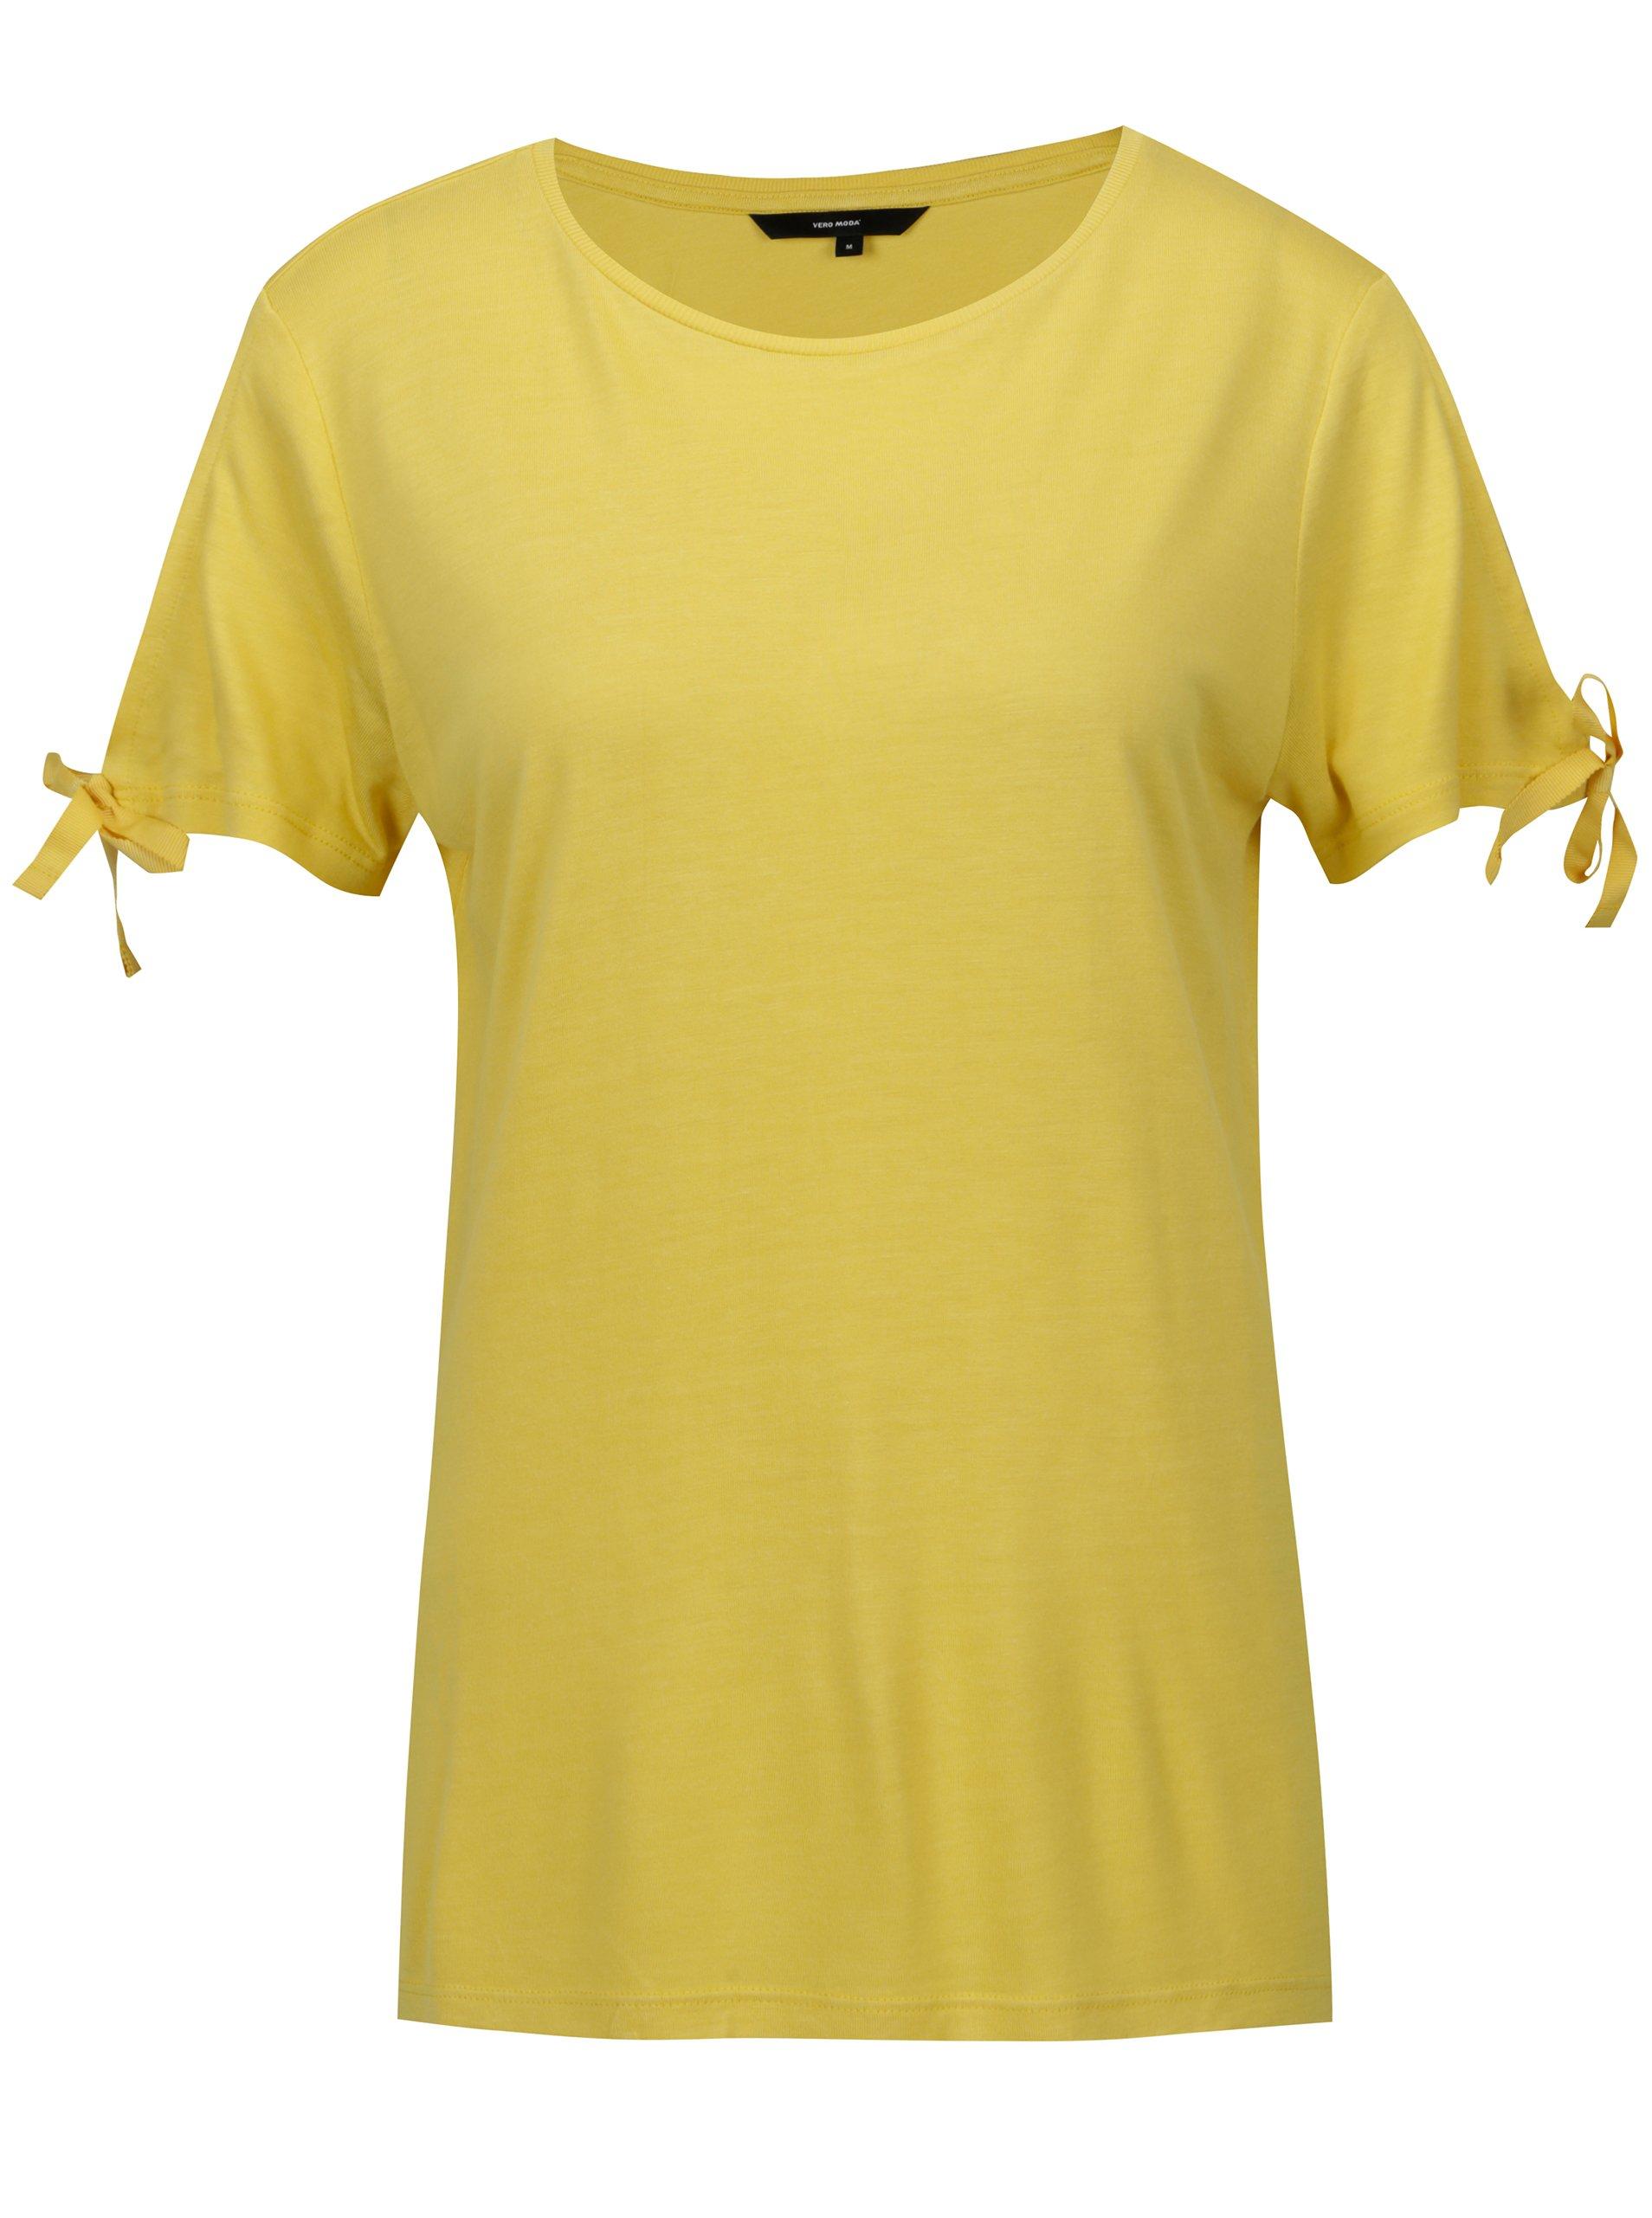 Žluté tričko VERO MODA Jemia